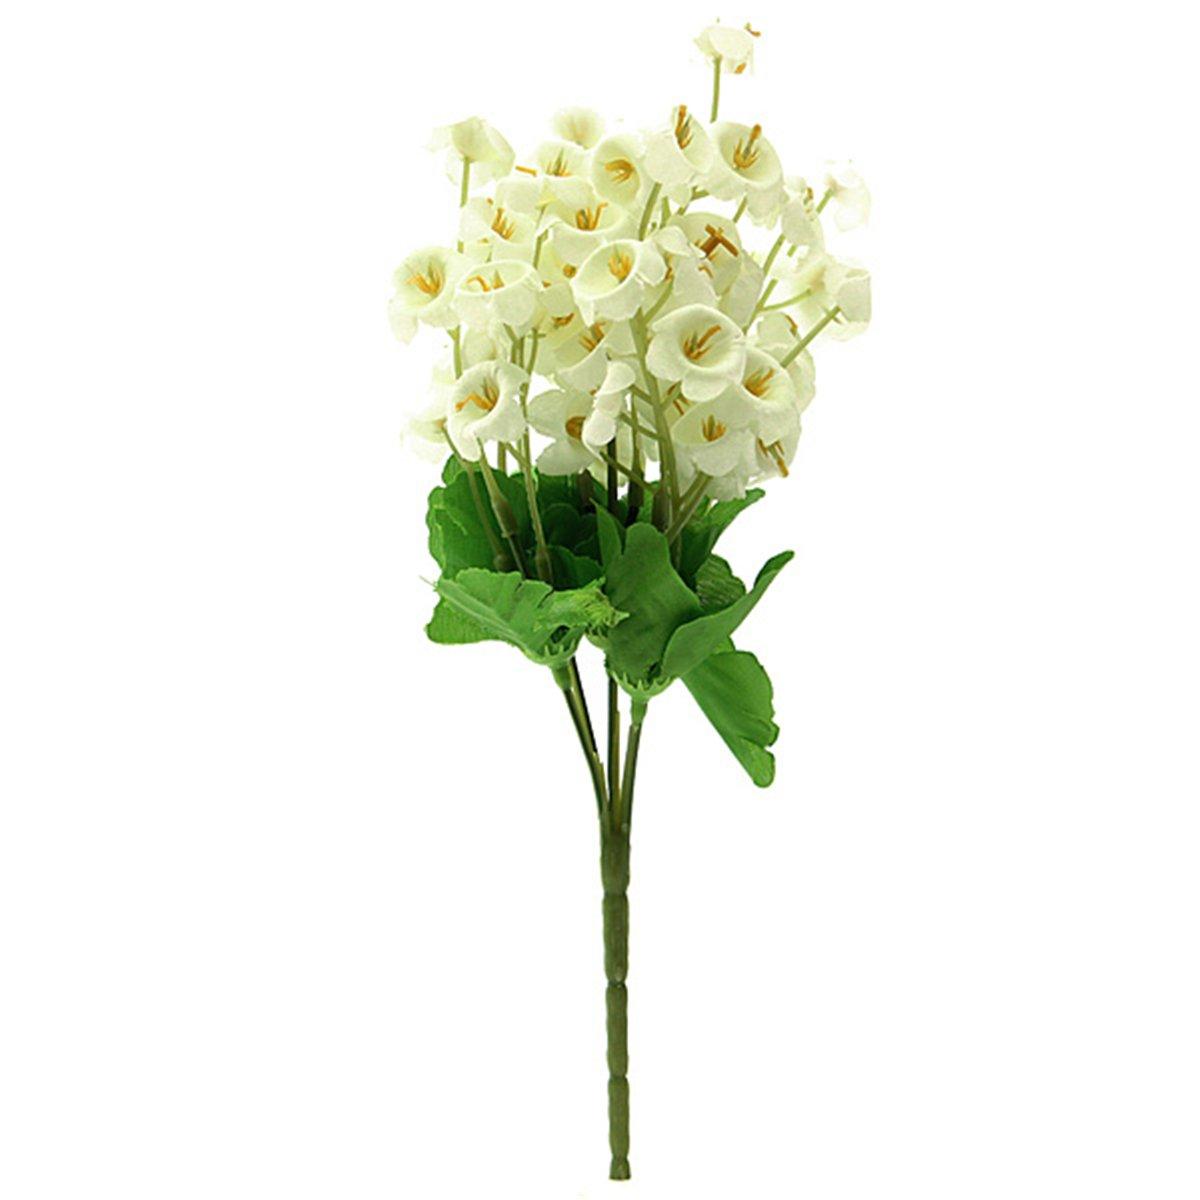 2x muguet bouquet artificial flowers plants marriage office home decoration f8j ebay. Black Bedroom Furniture Sets. Home Design Ideas